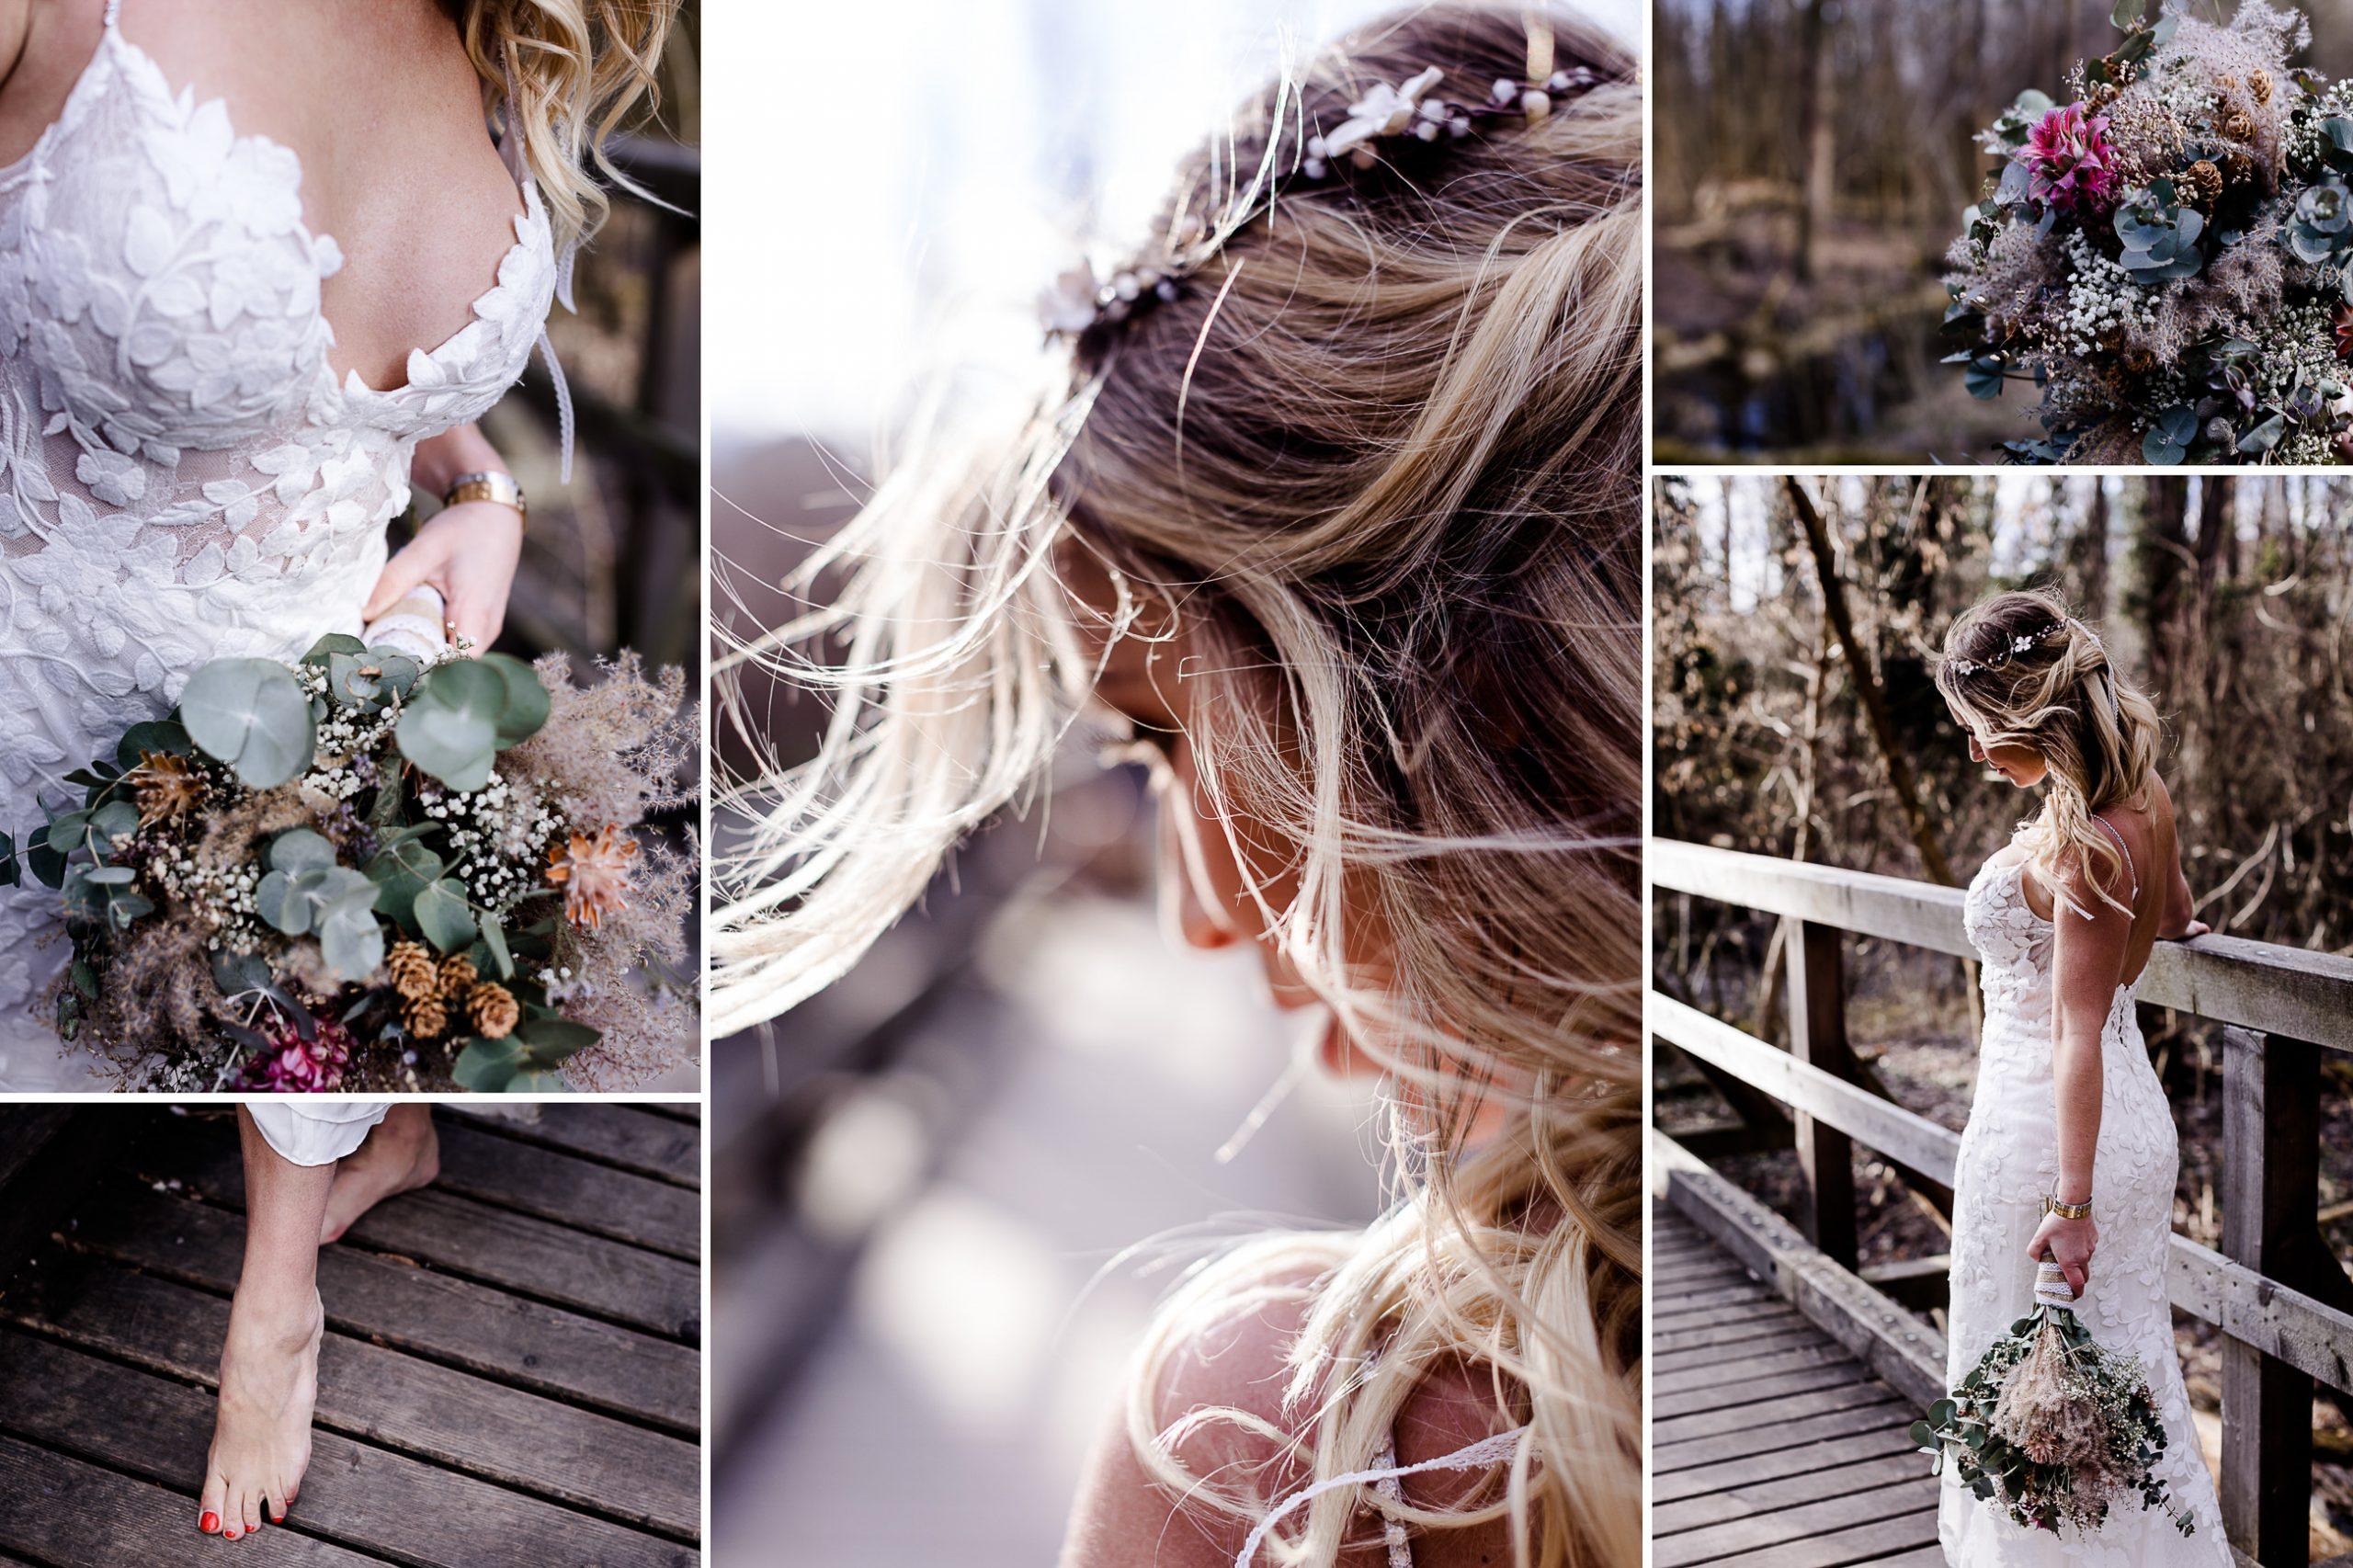 MPB-Photography / Everlasting Moments